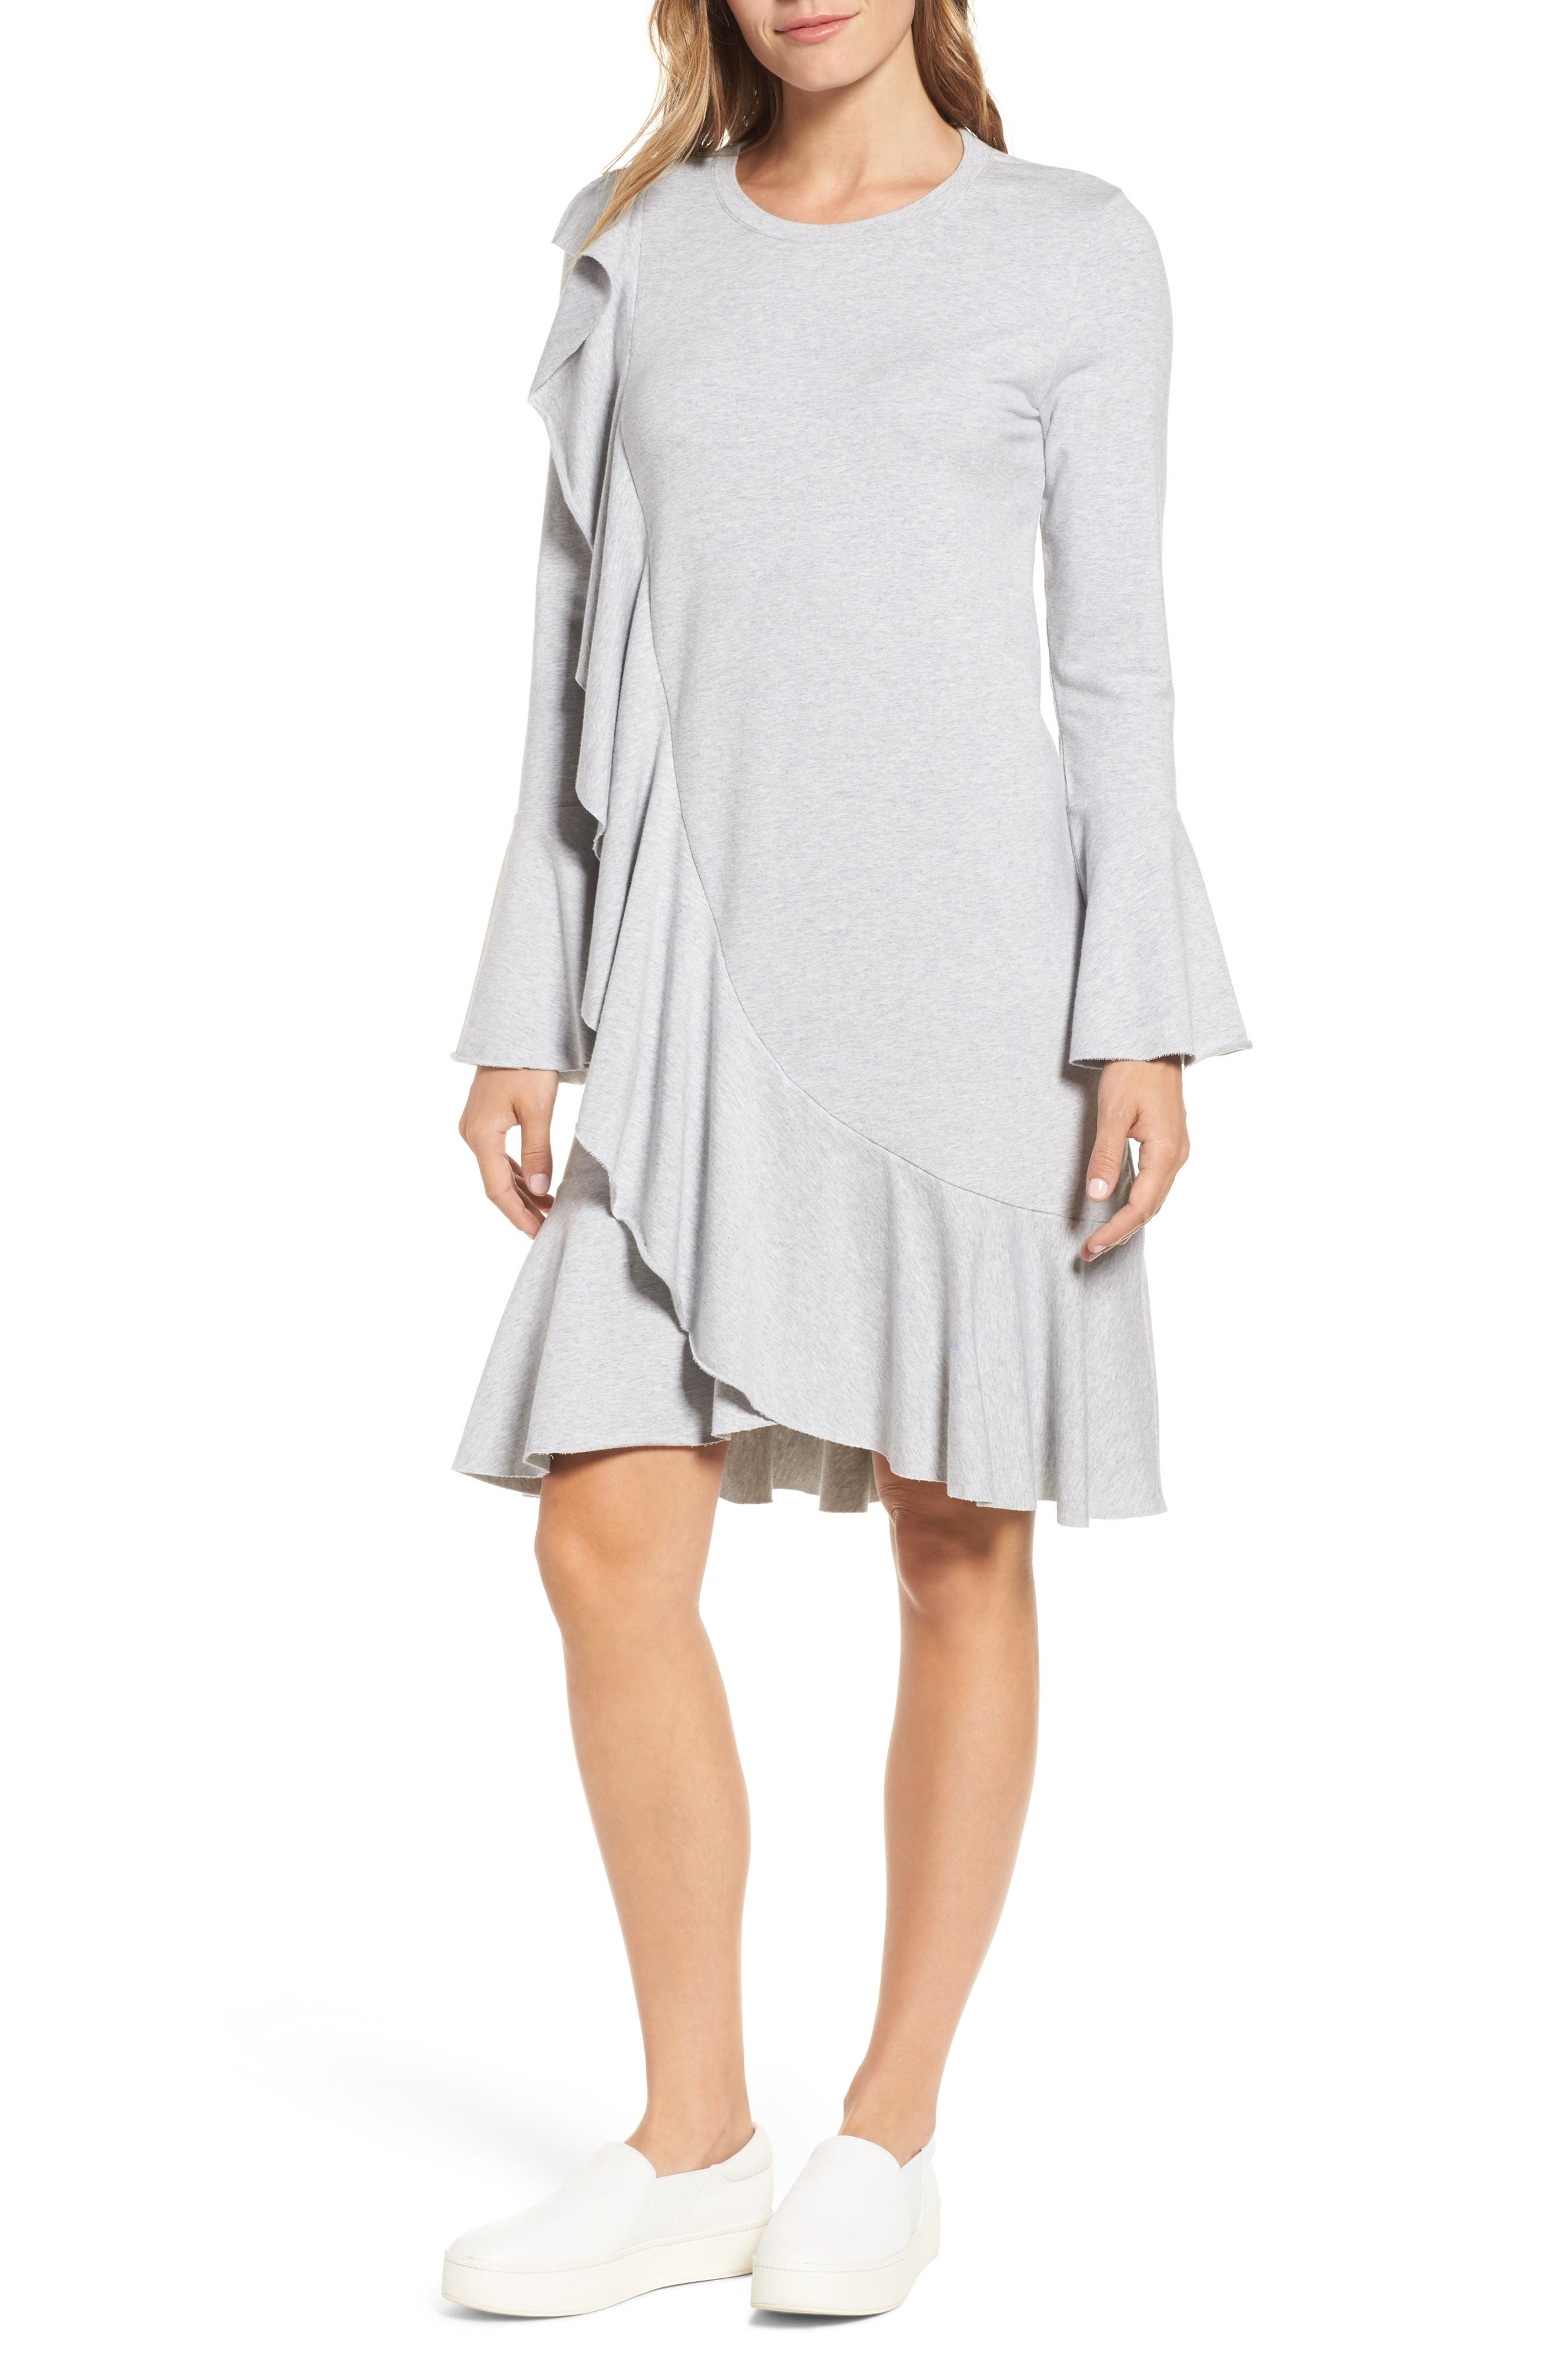 Ruffle Detail Knit Dress,                             Alternate thumbnail 14, color,